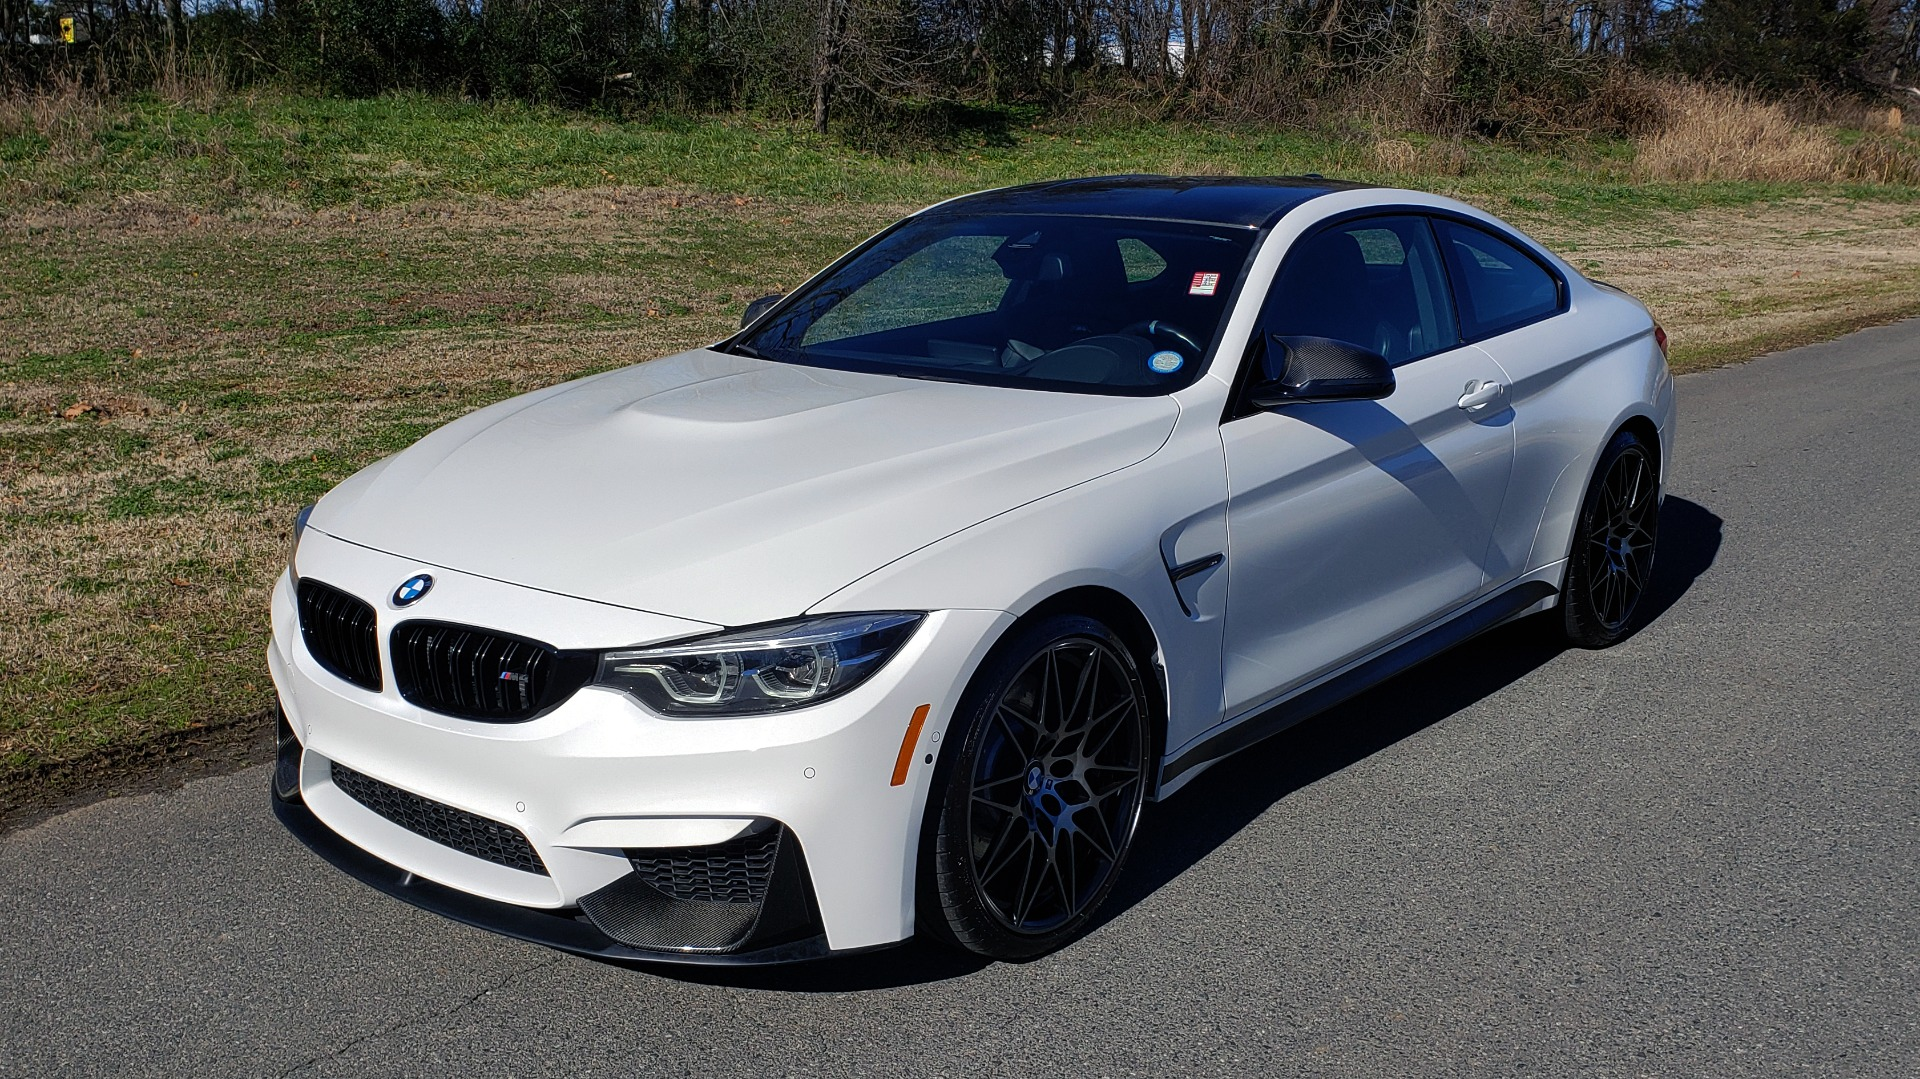 Used 2018 BMW M4 COMP PKG / EXEC / M-DRIVER / PARK CNTRL / ACTIVE BLIND SPOT for sale Sold at Formula Imports in Charlotte NC 28227 2